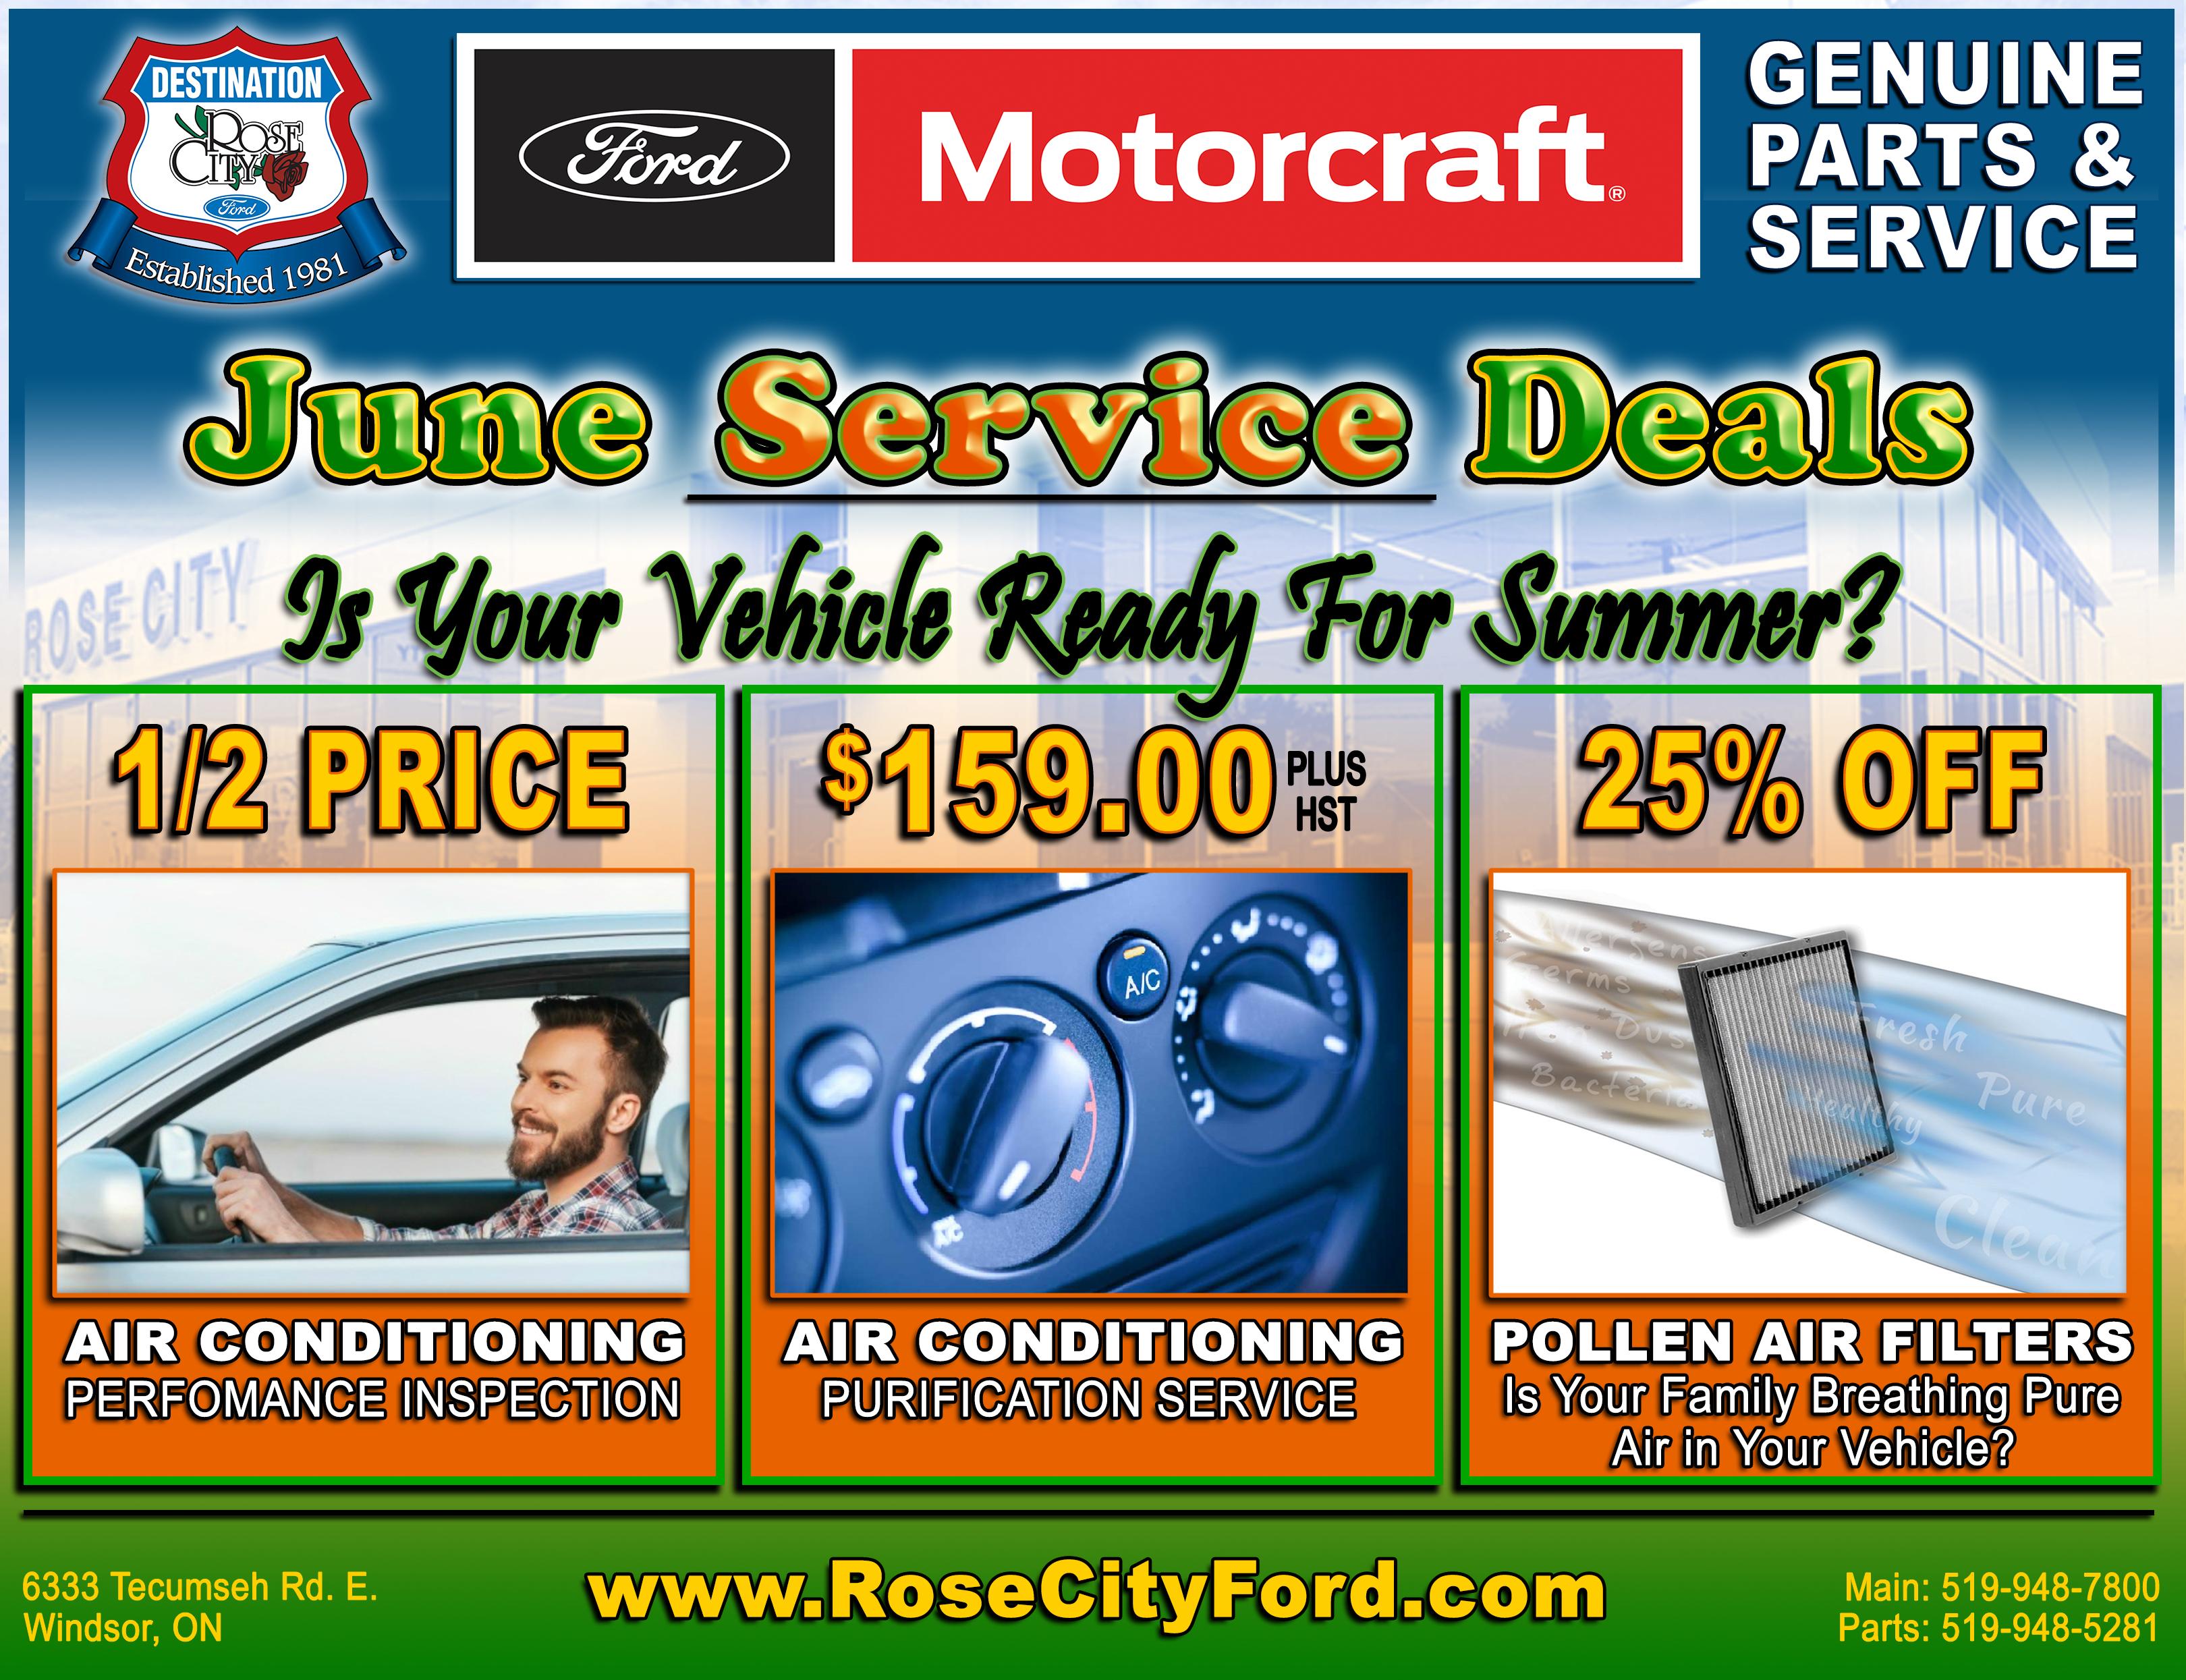 June Service Deals